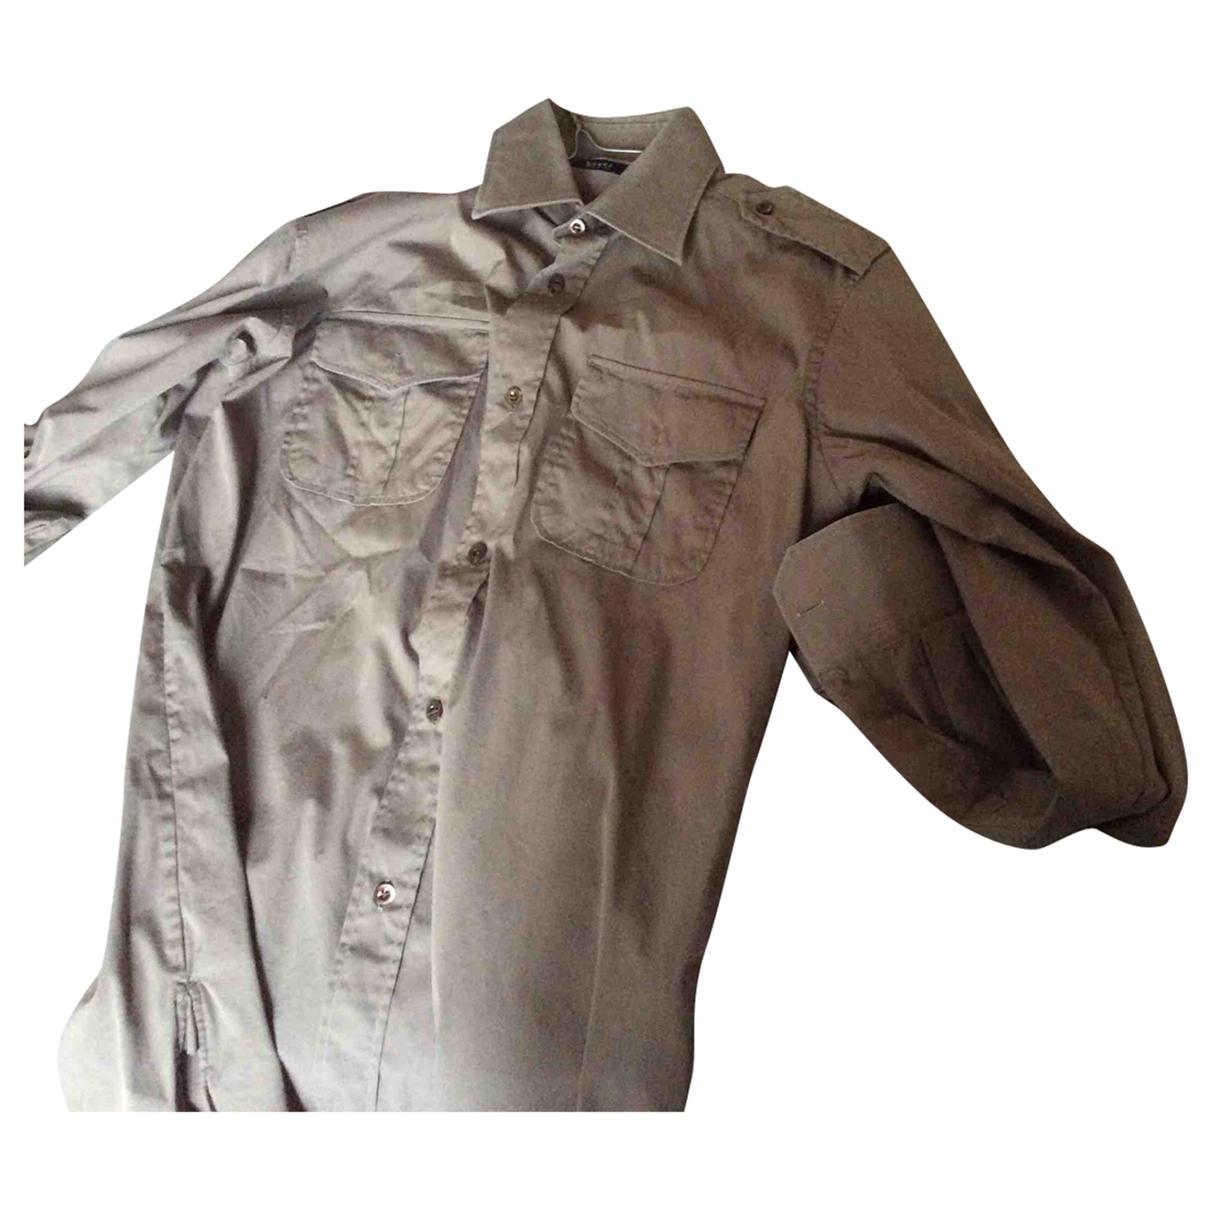 Gucci \N Beige Cotton Shirts for Men 37 EU (tour de cou / collar)